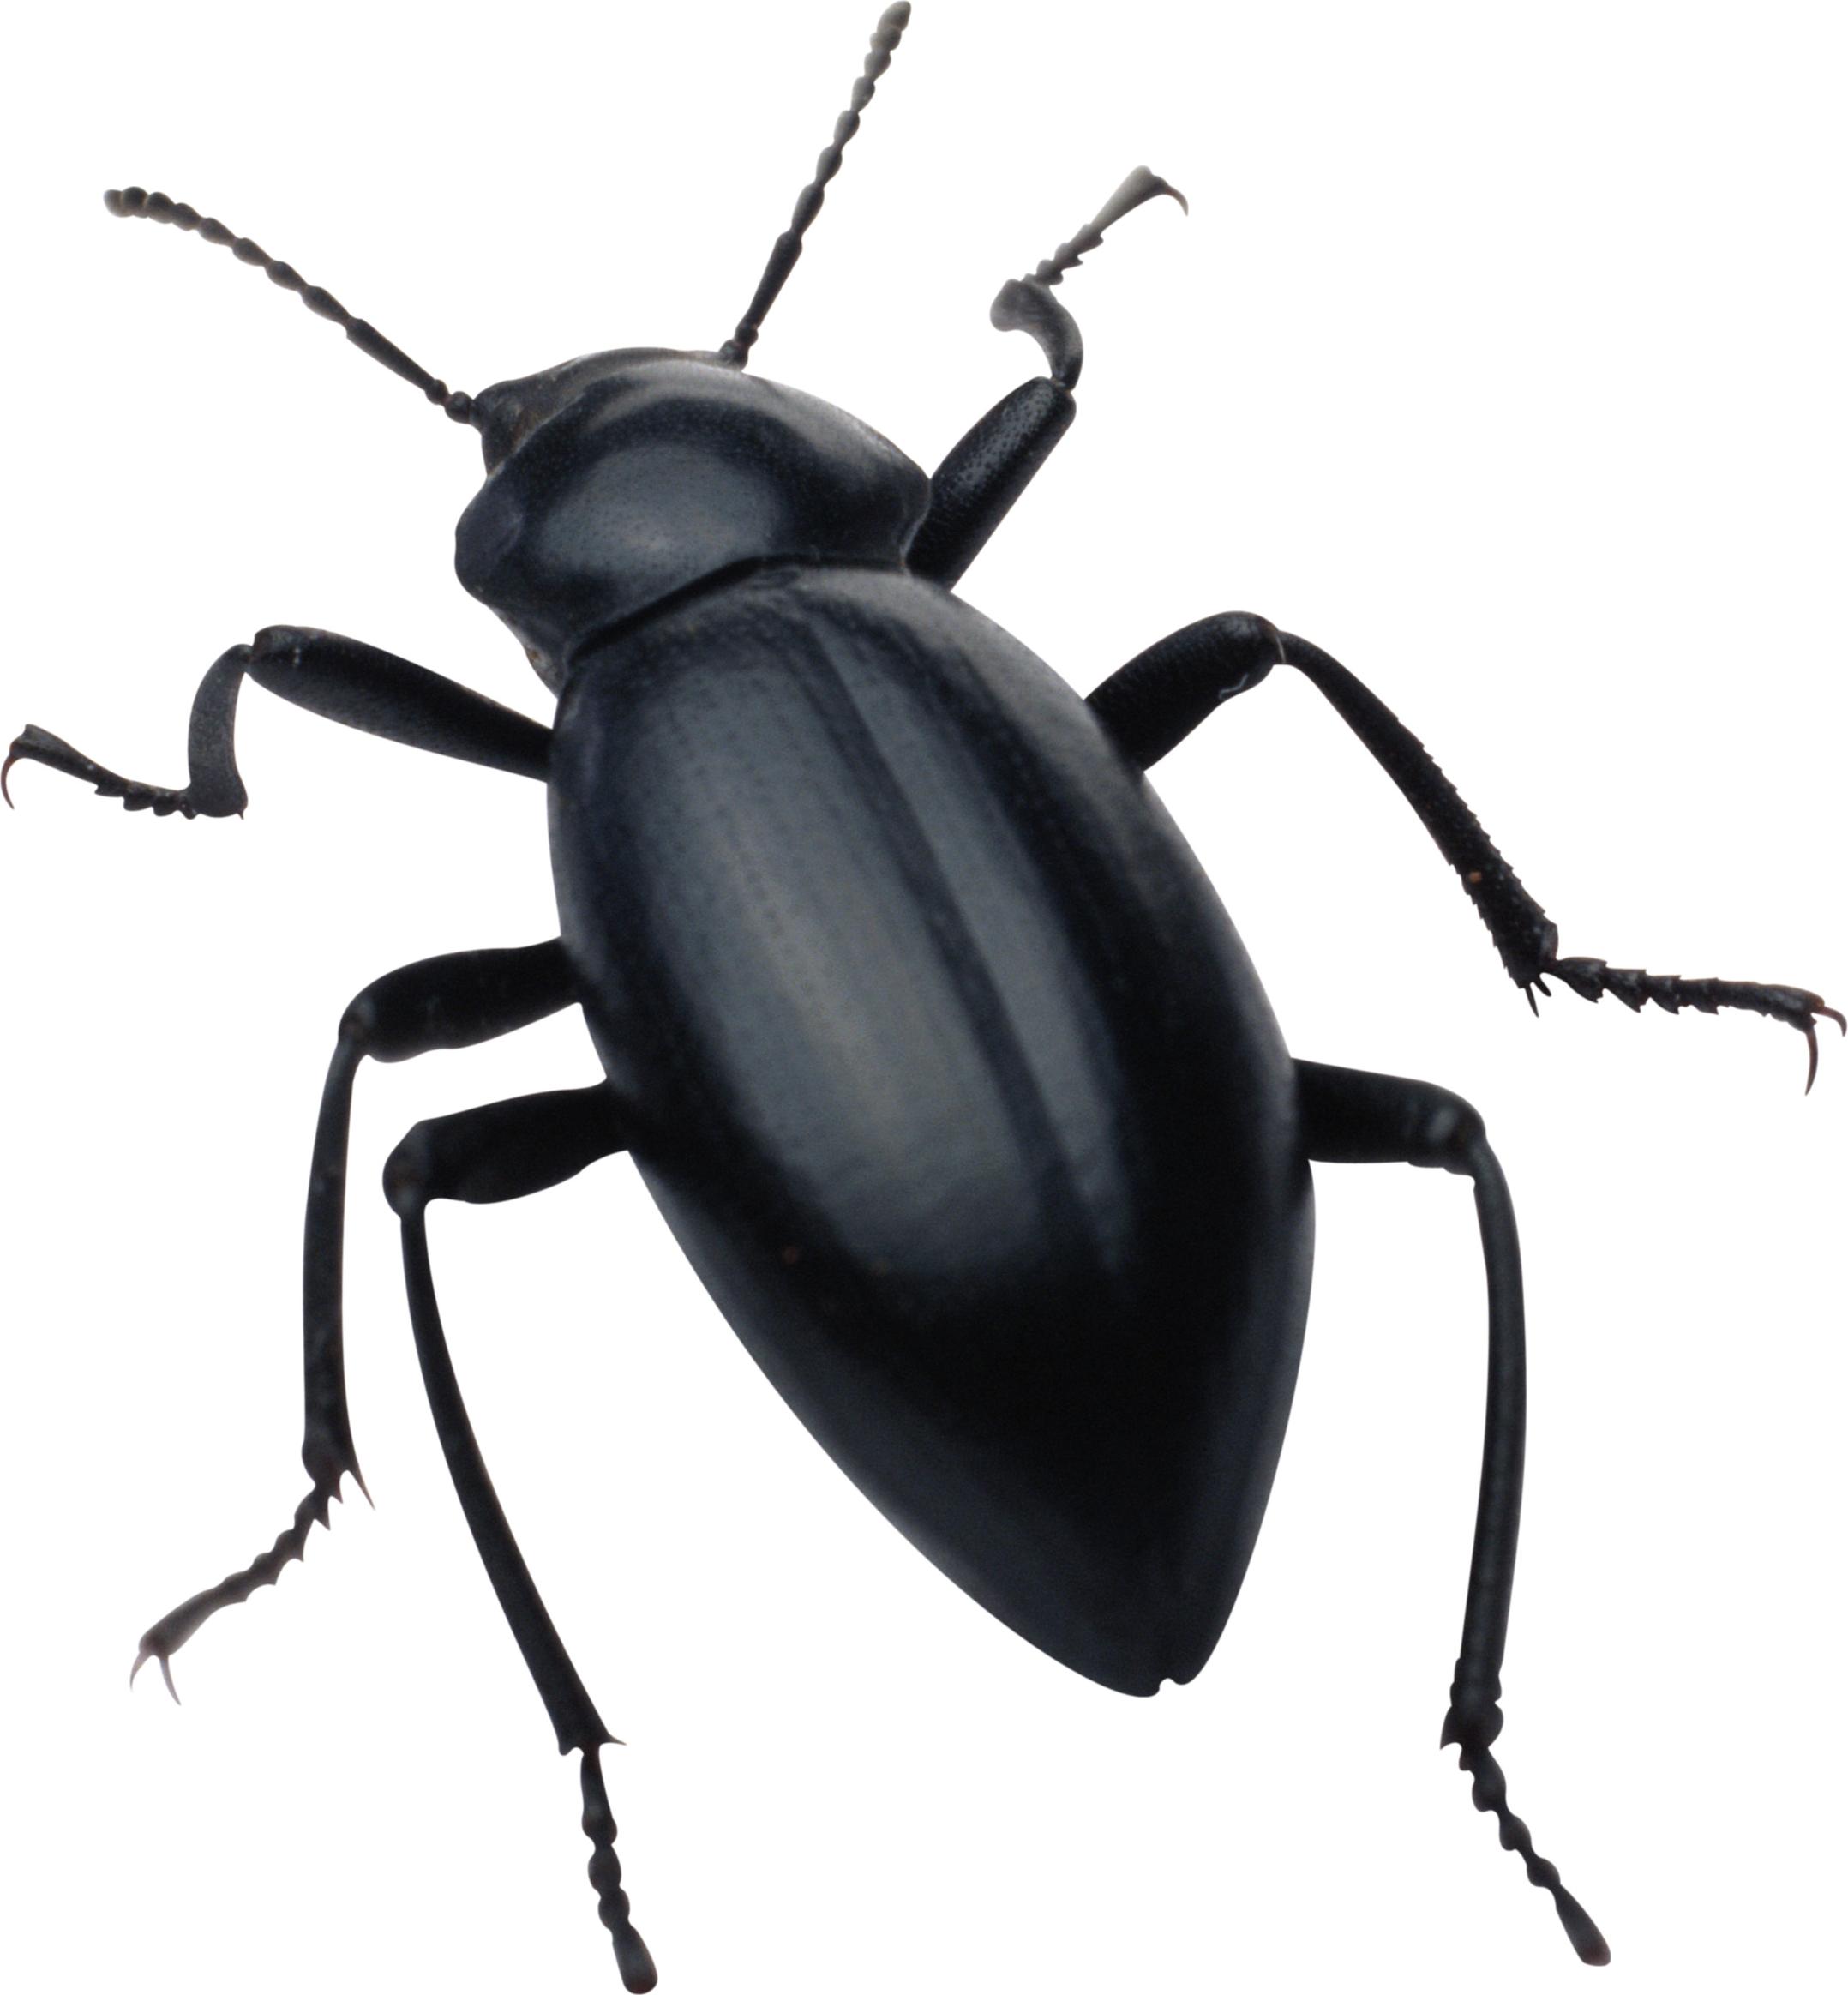 Mosquito clipart aquatic insect, Mosquito aquatic insect.